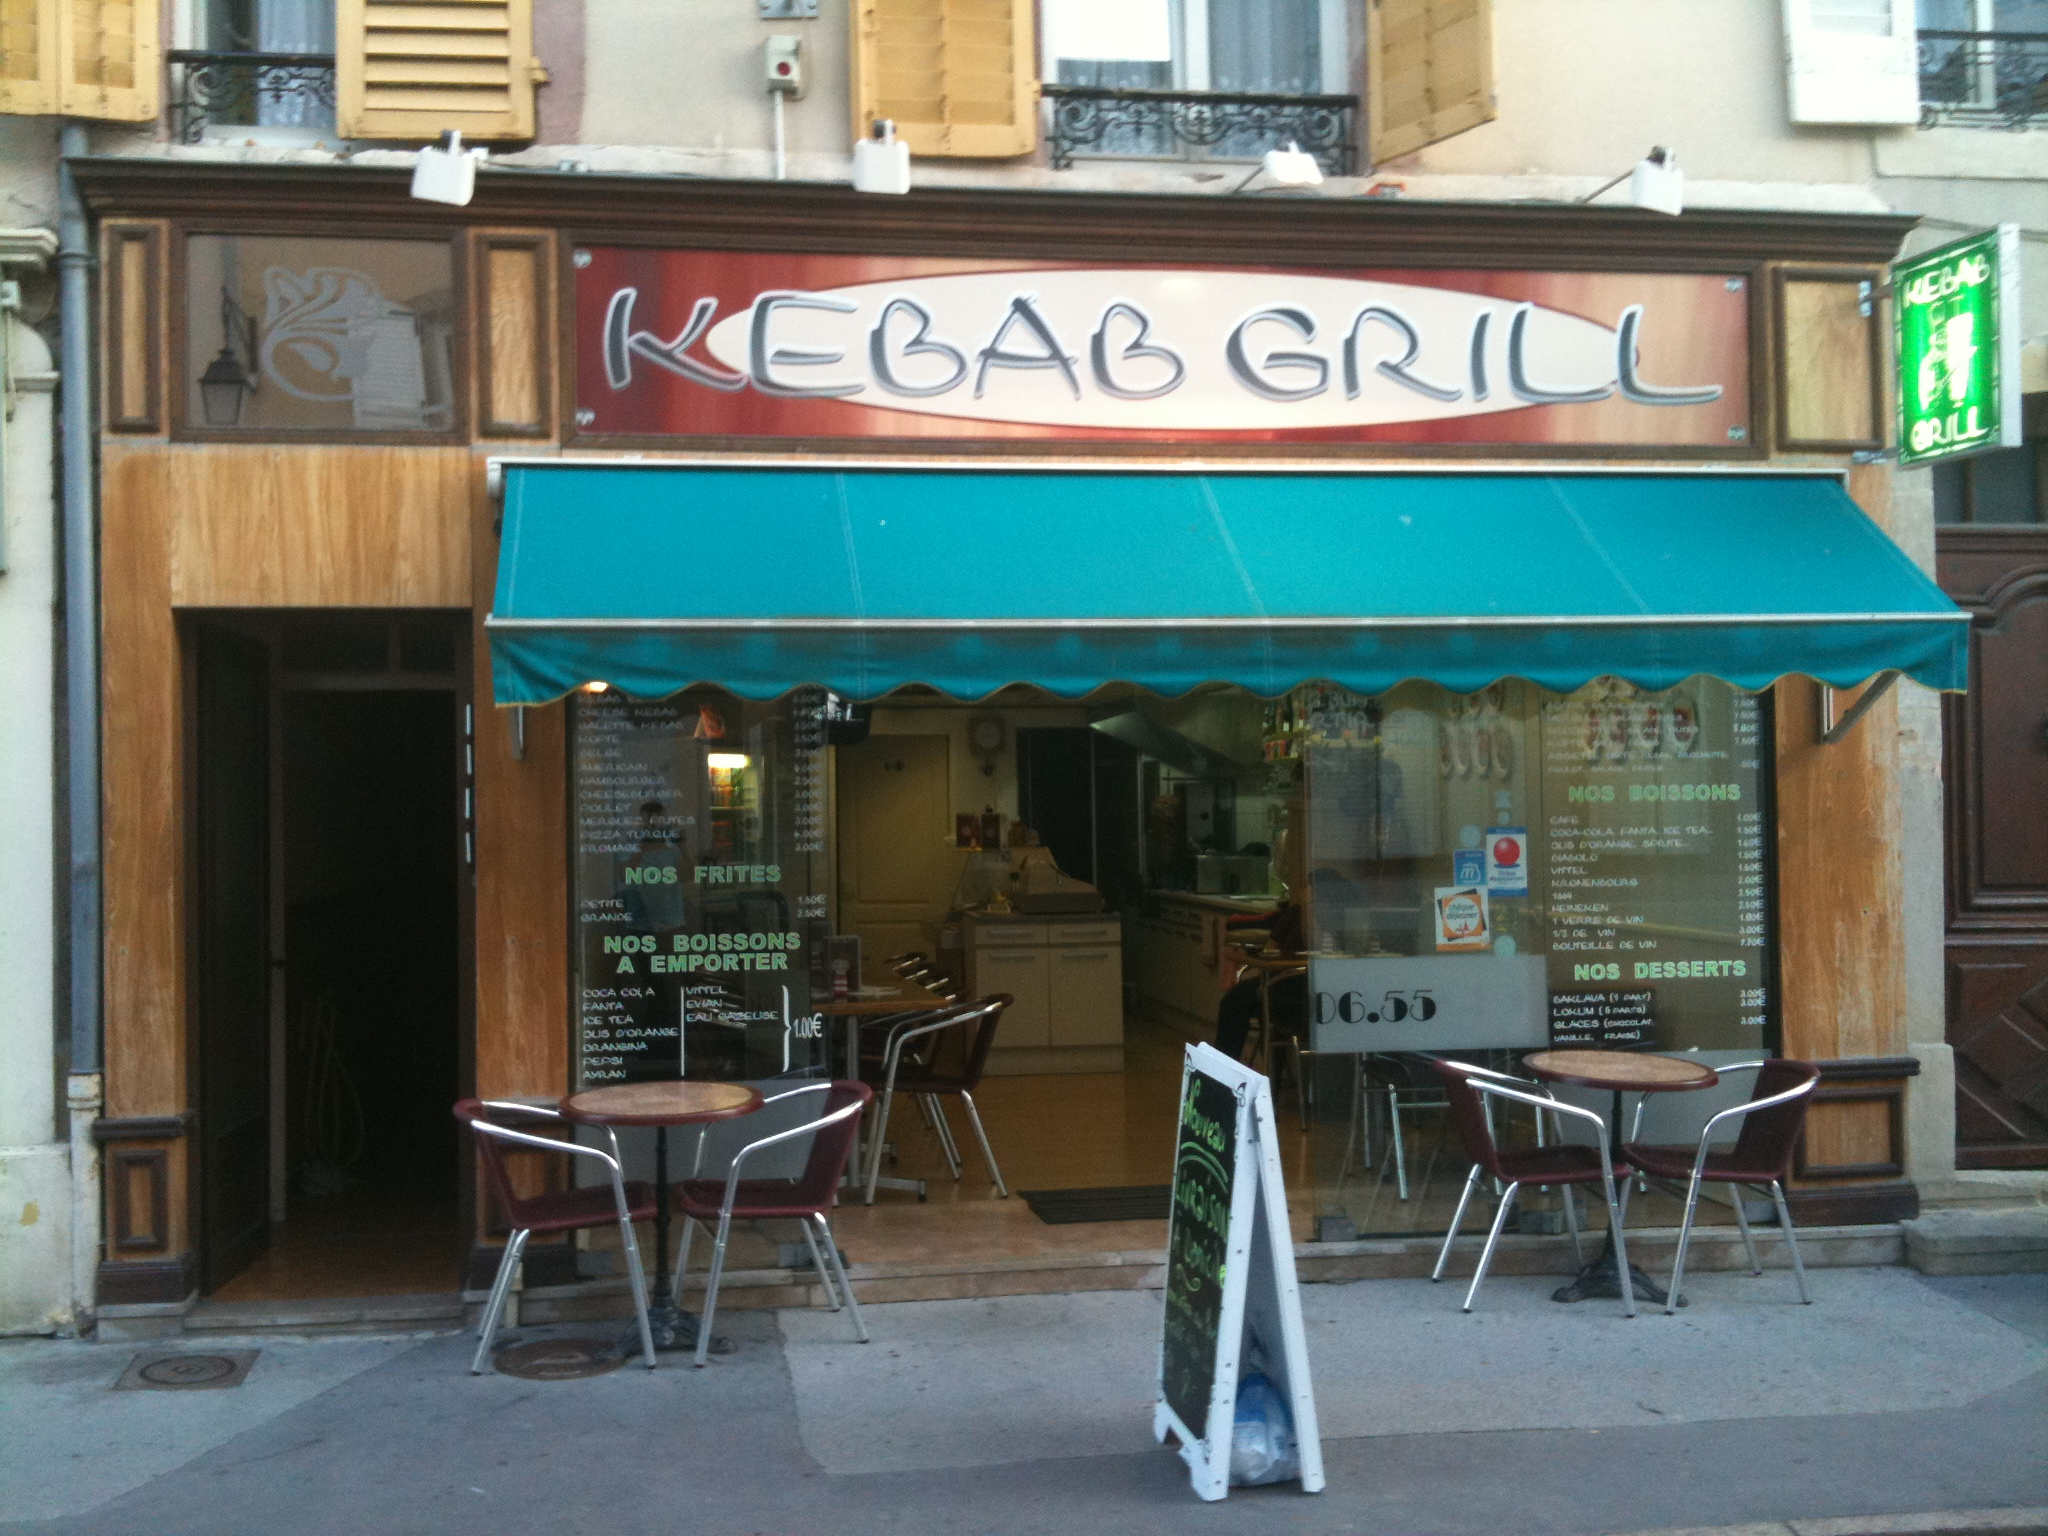 Kebab Grill Lunéville